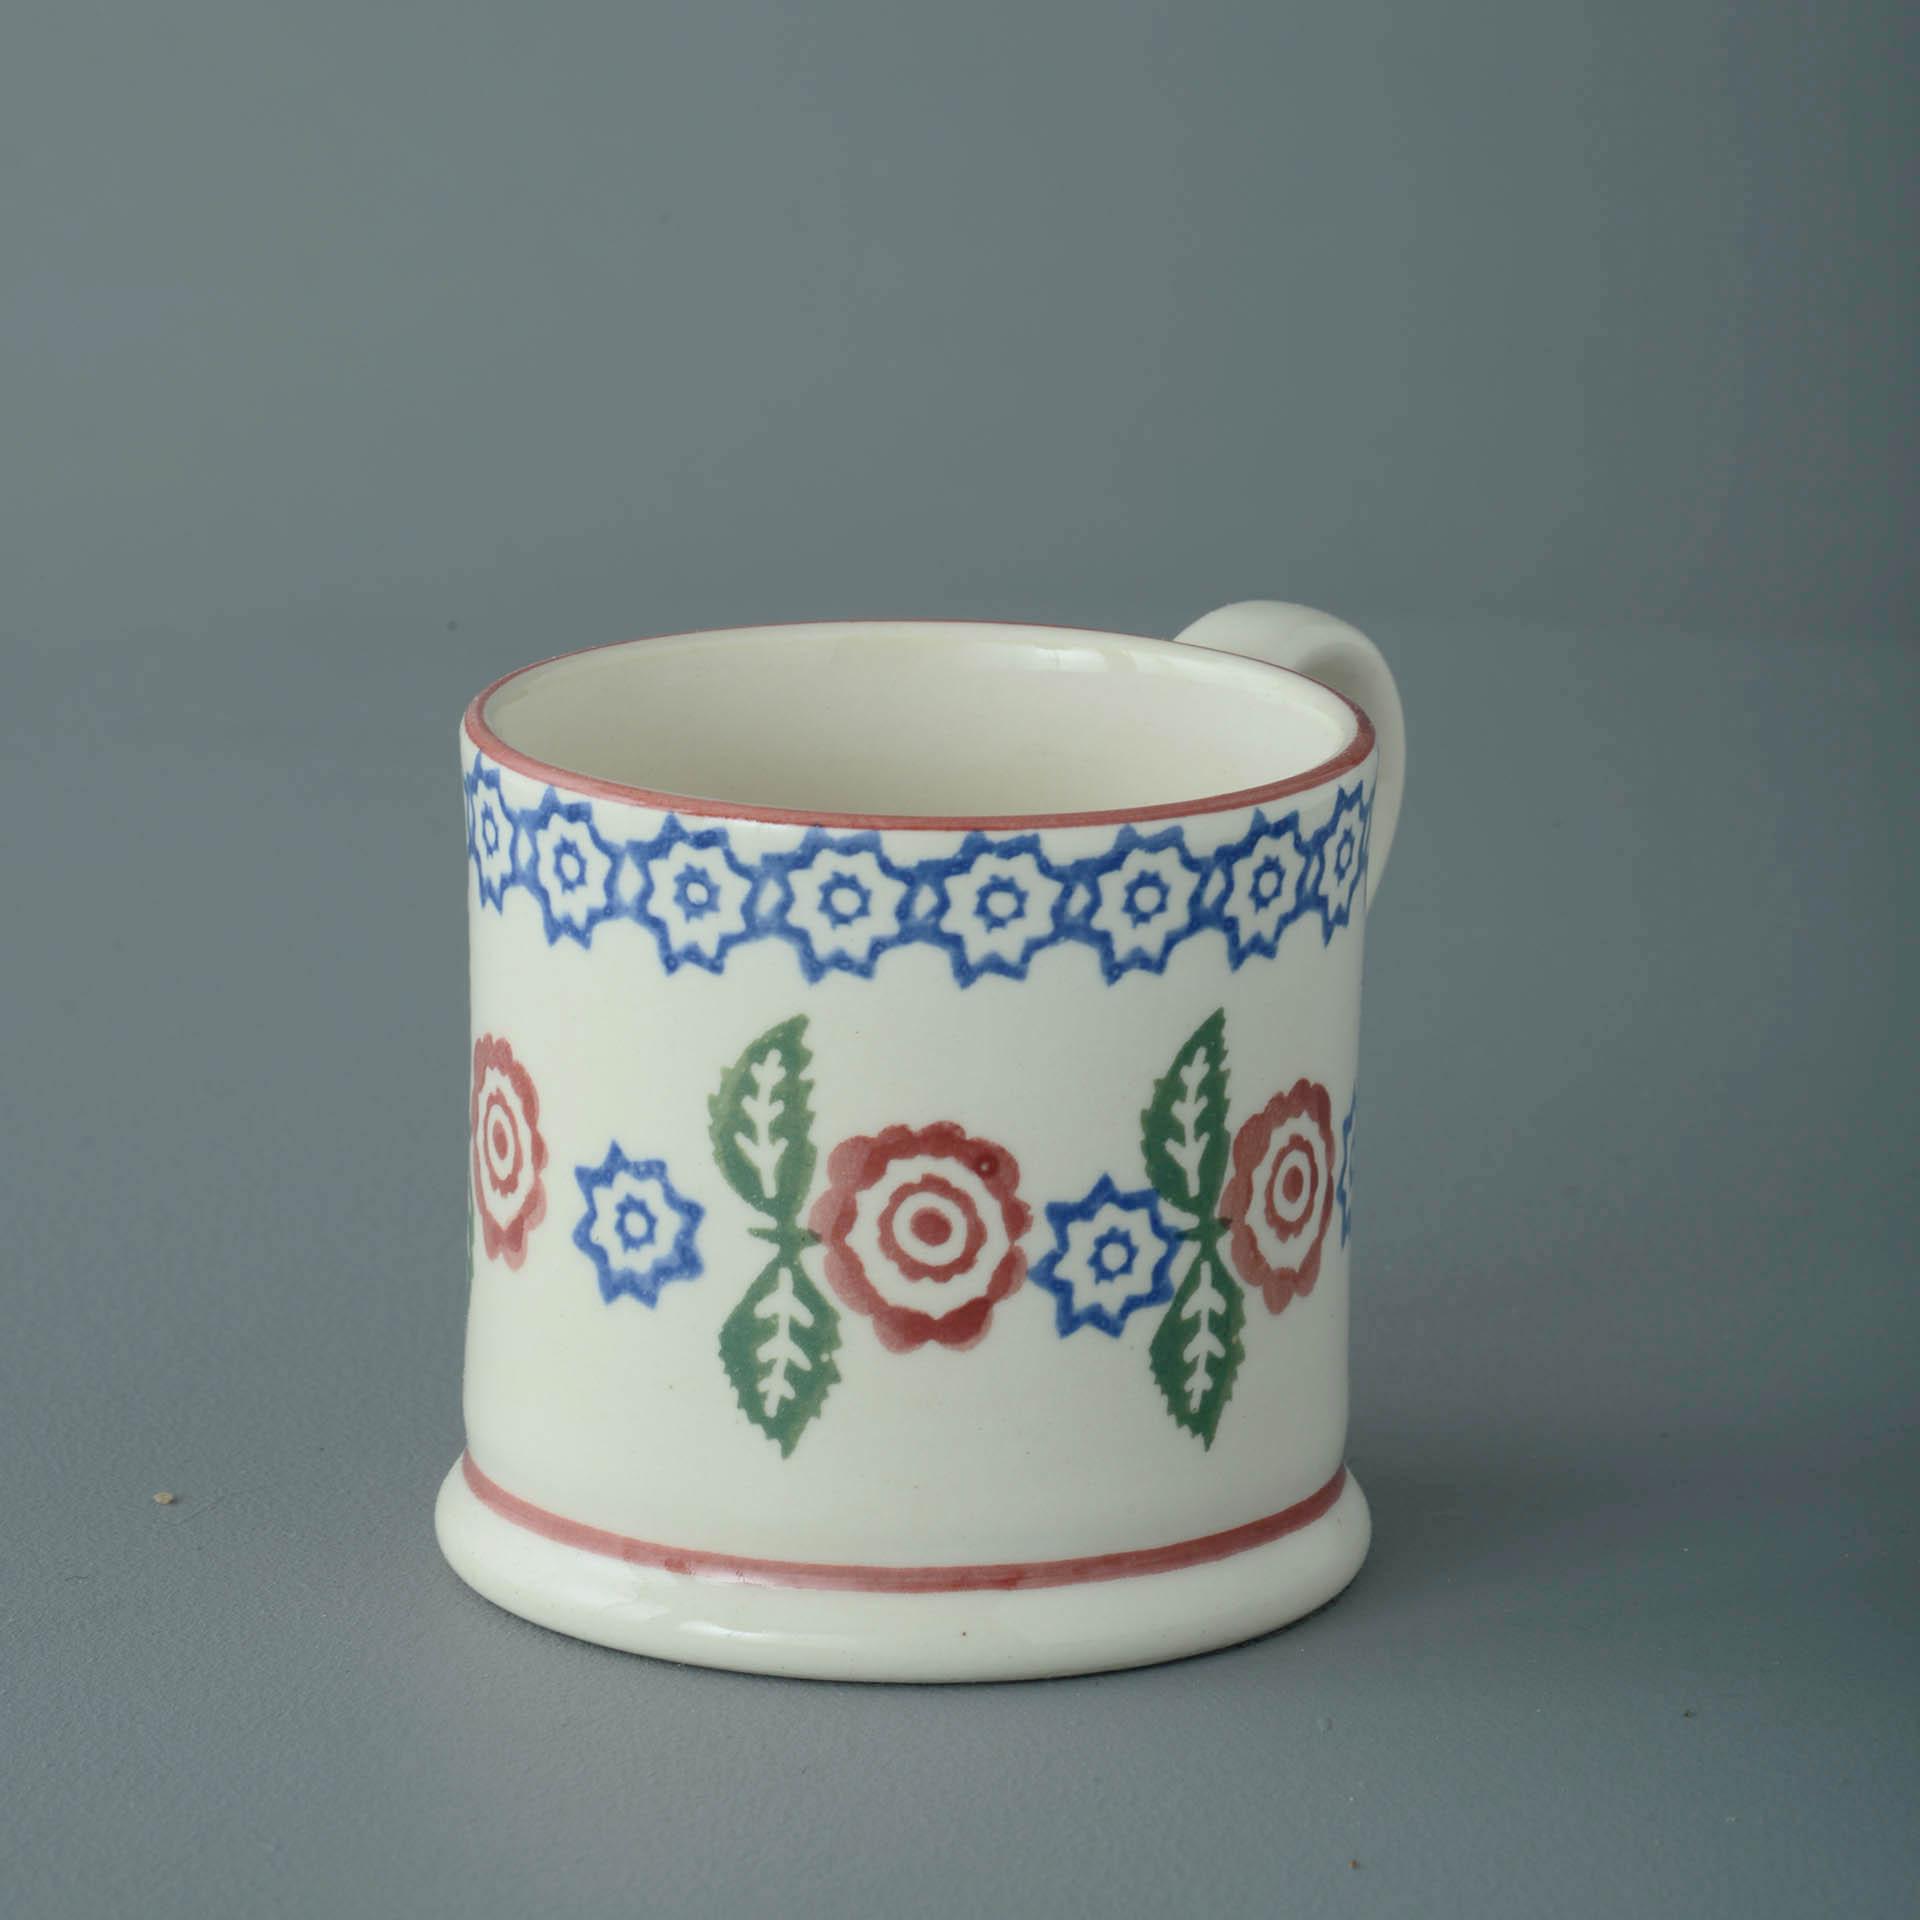 Victorian Floral 150ml Small Mug 7 x 7.3cm